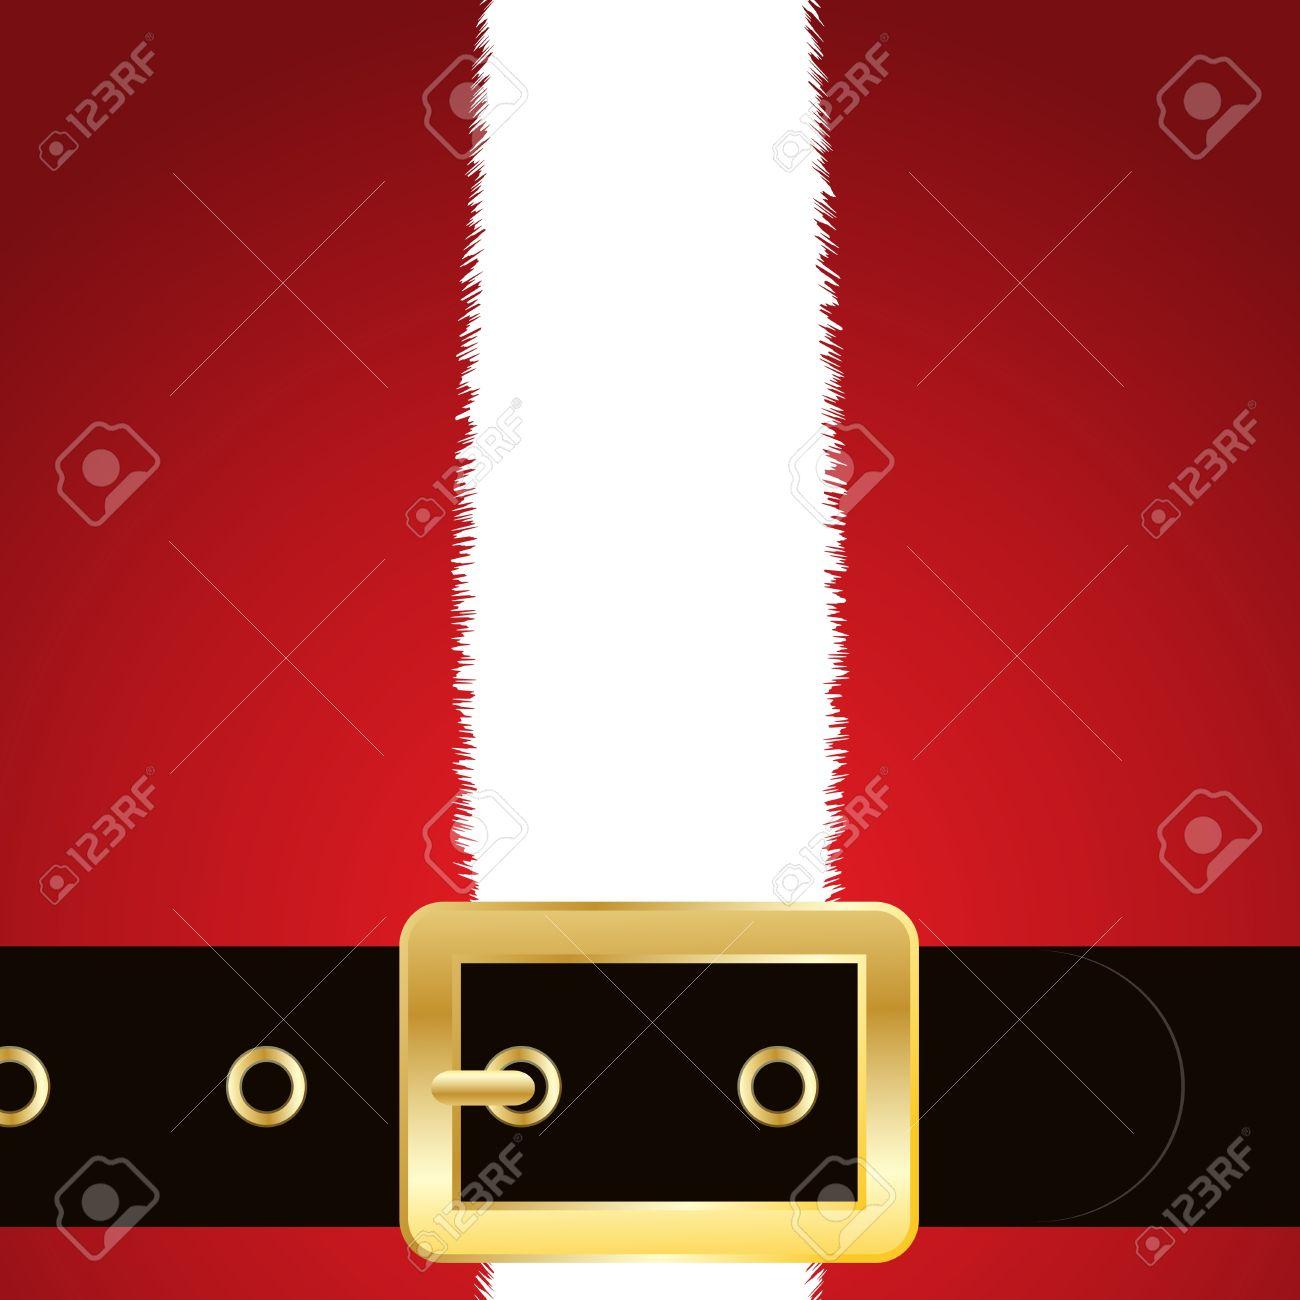 close up of the coat and belt of santa claus stock photo 10528822 - Santa Claus Belt